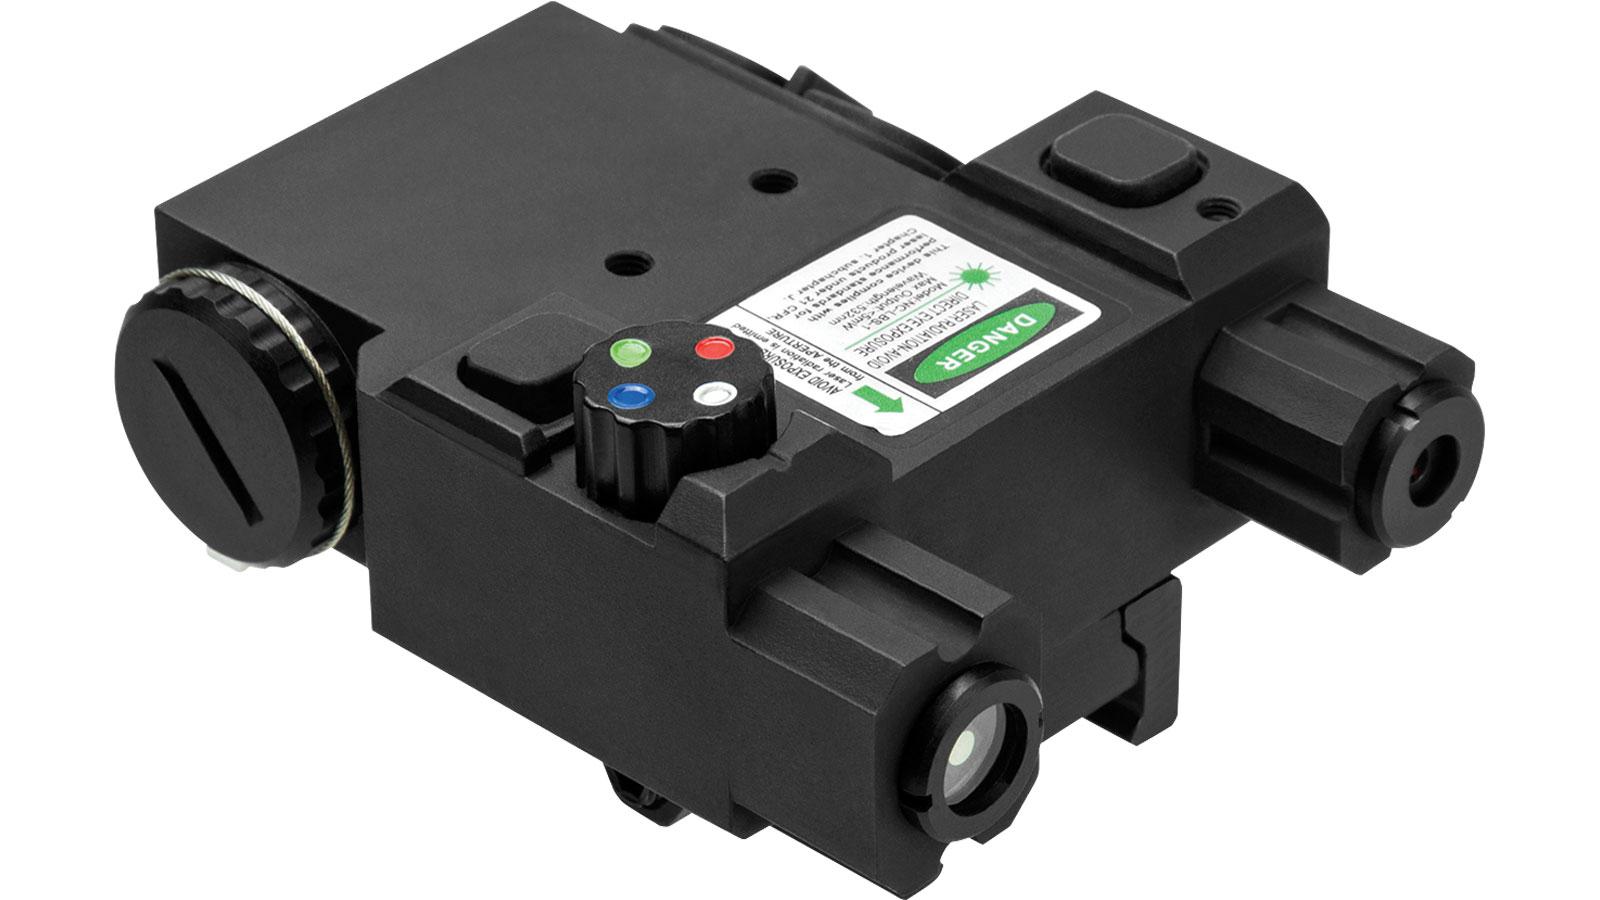 NC Star Green Laser 4X LED Nav Light Box QR Mount Black